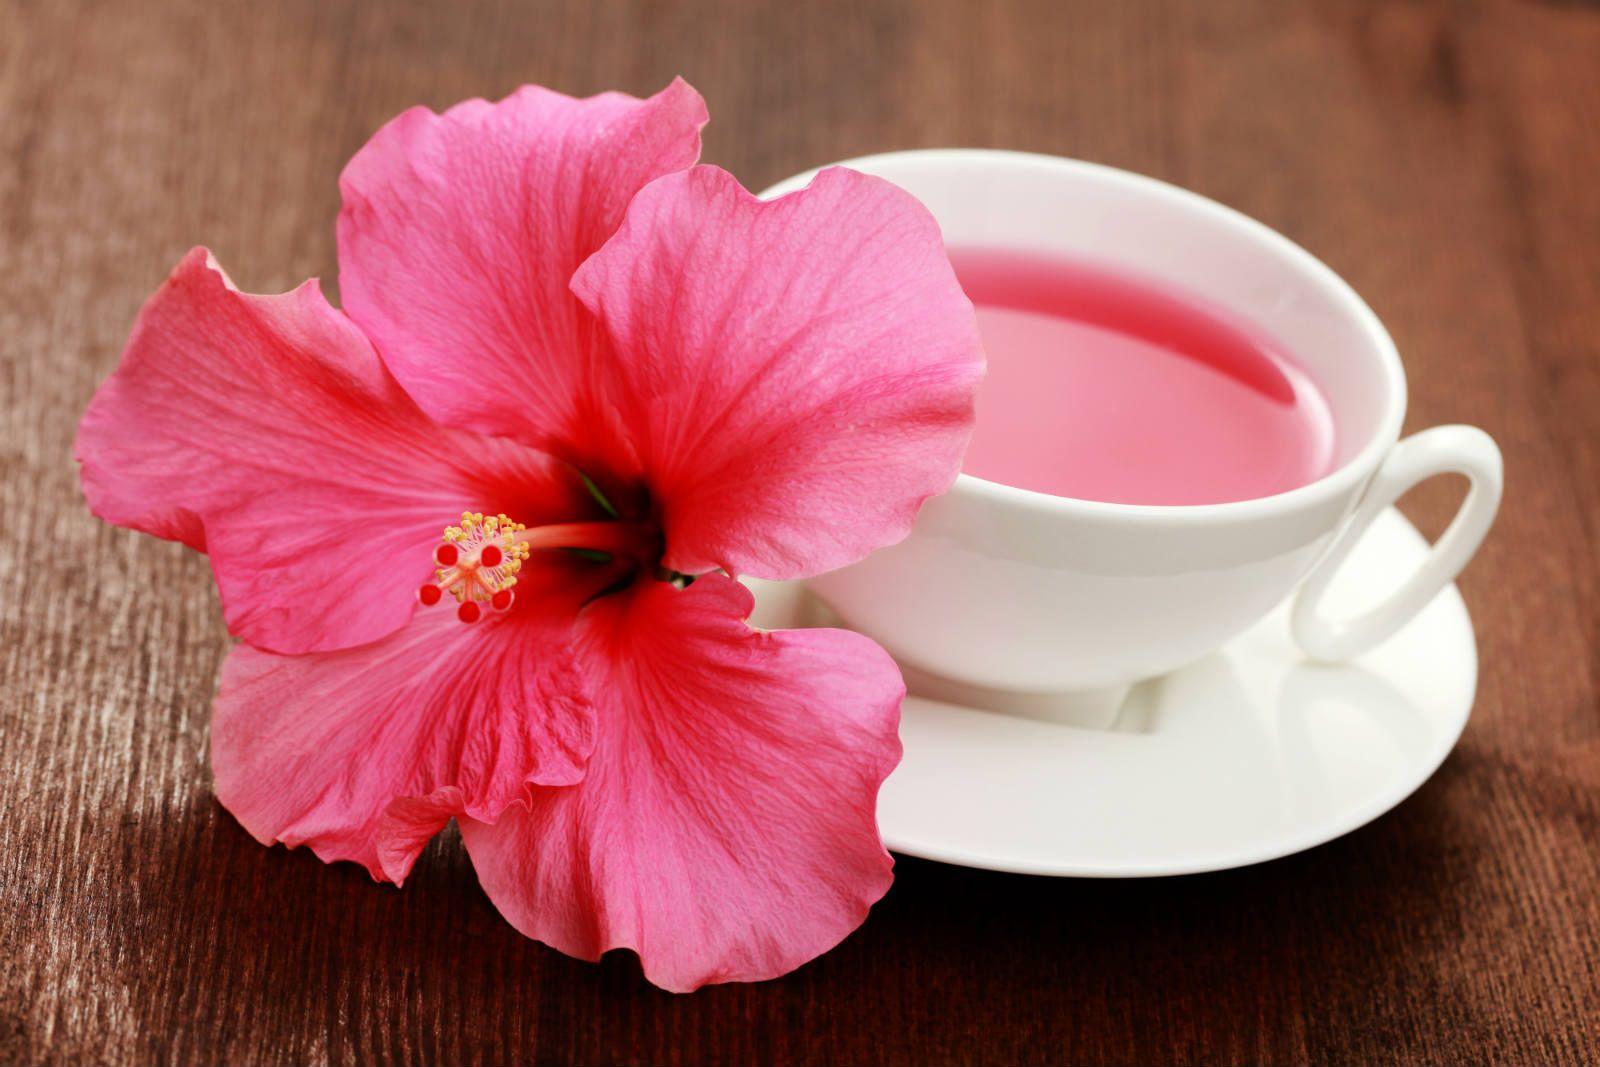 Health benefits of drinking hibiscus tea 1mhealthtips your body health benefits of drinking hibiscus tea 1mhealthtips izmirmasajfo